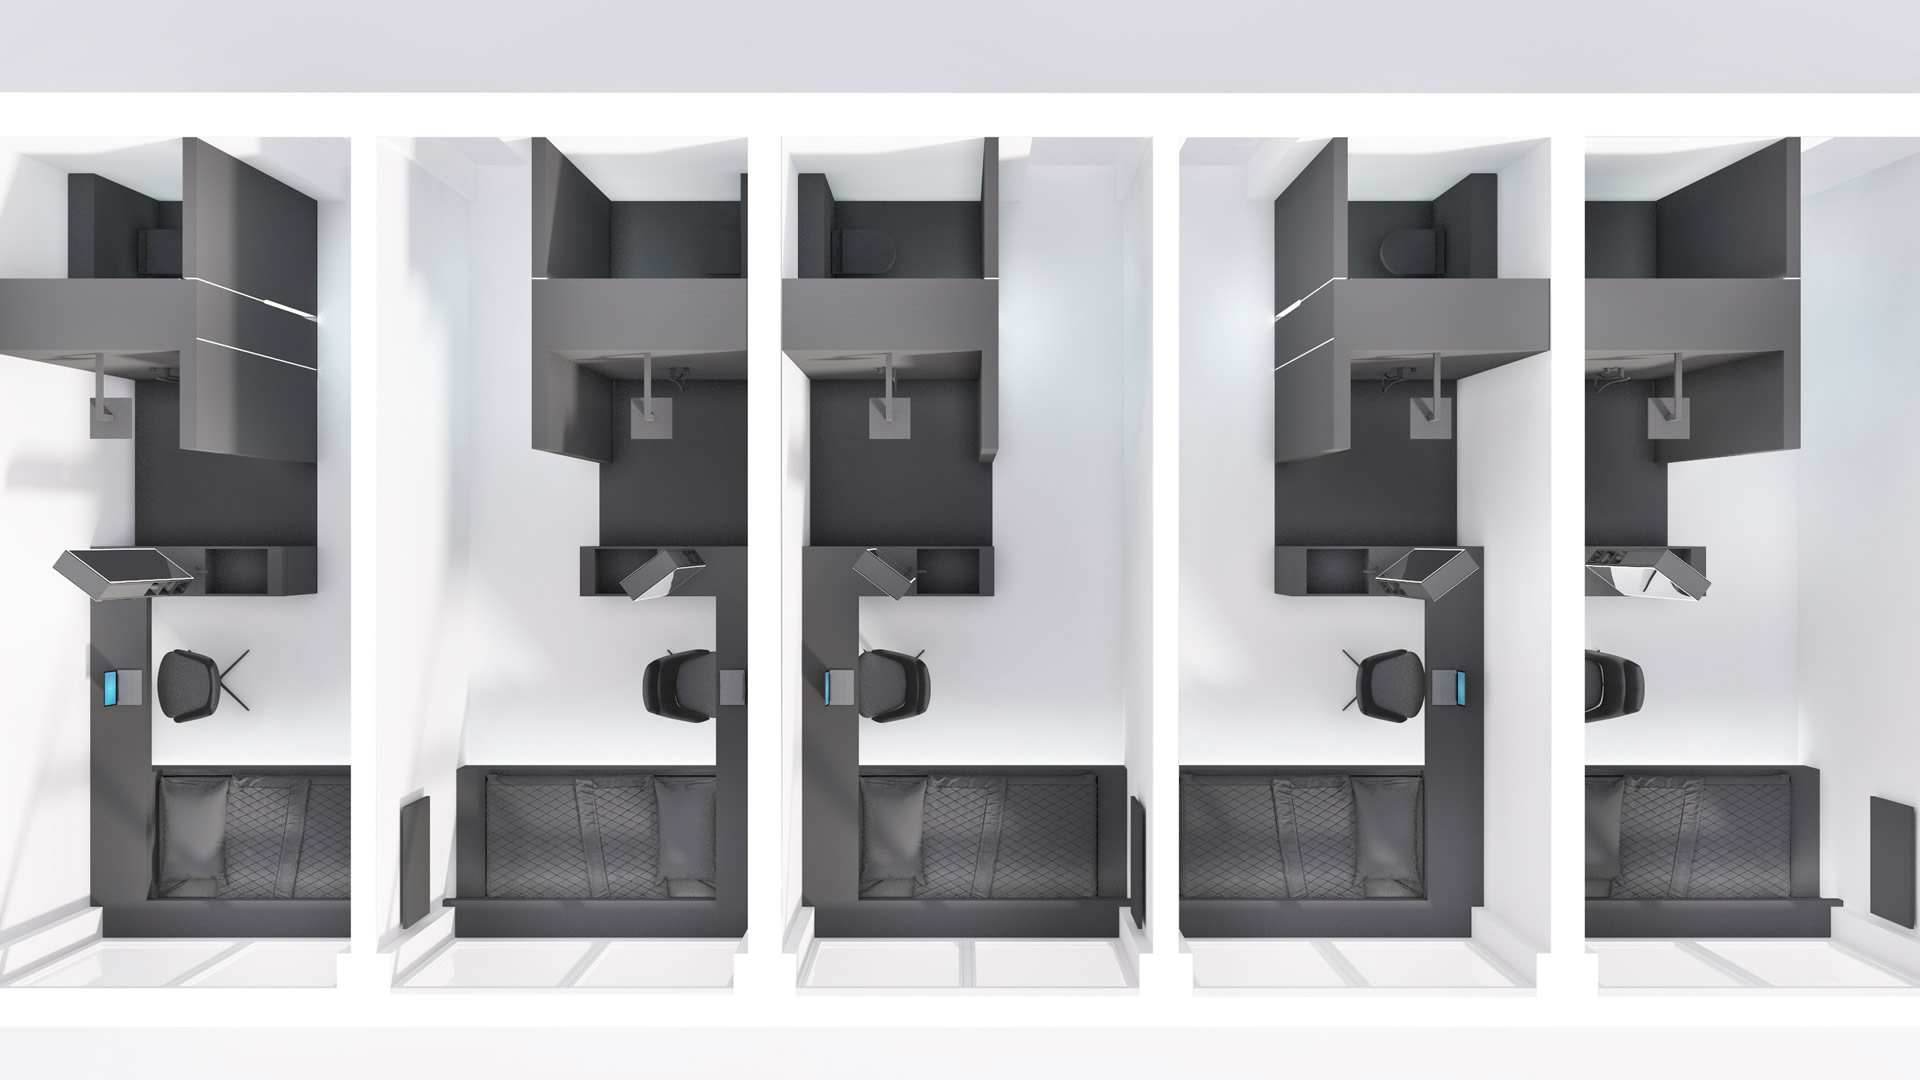 whocares_design_hotel_room_ (1).jpg